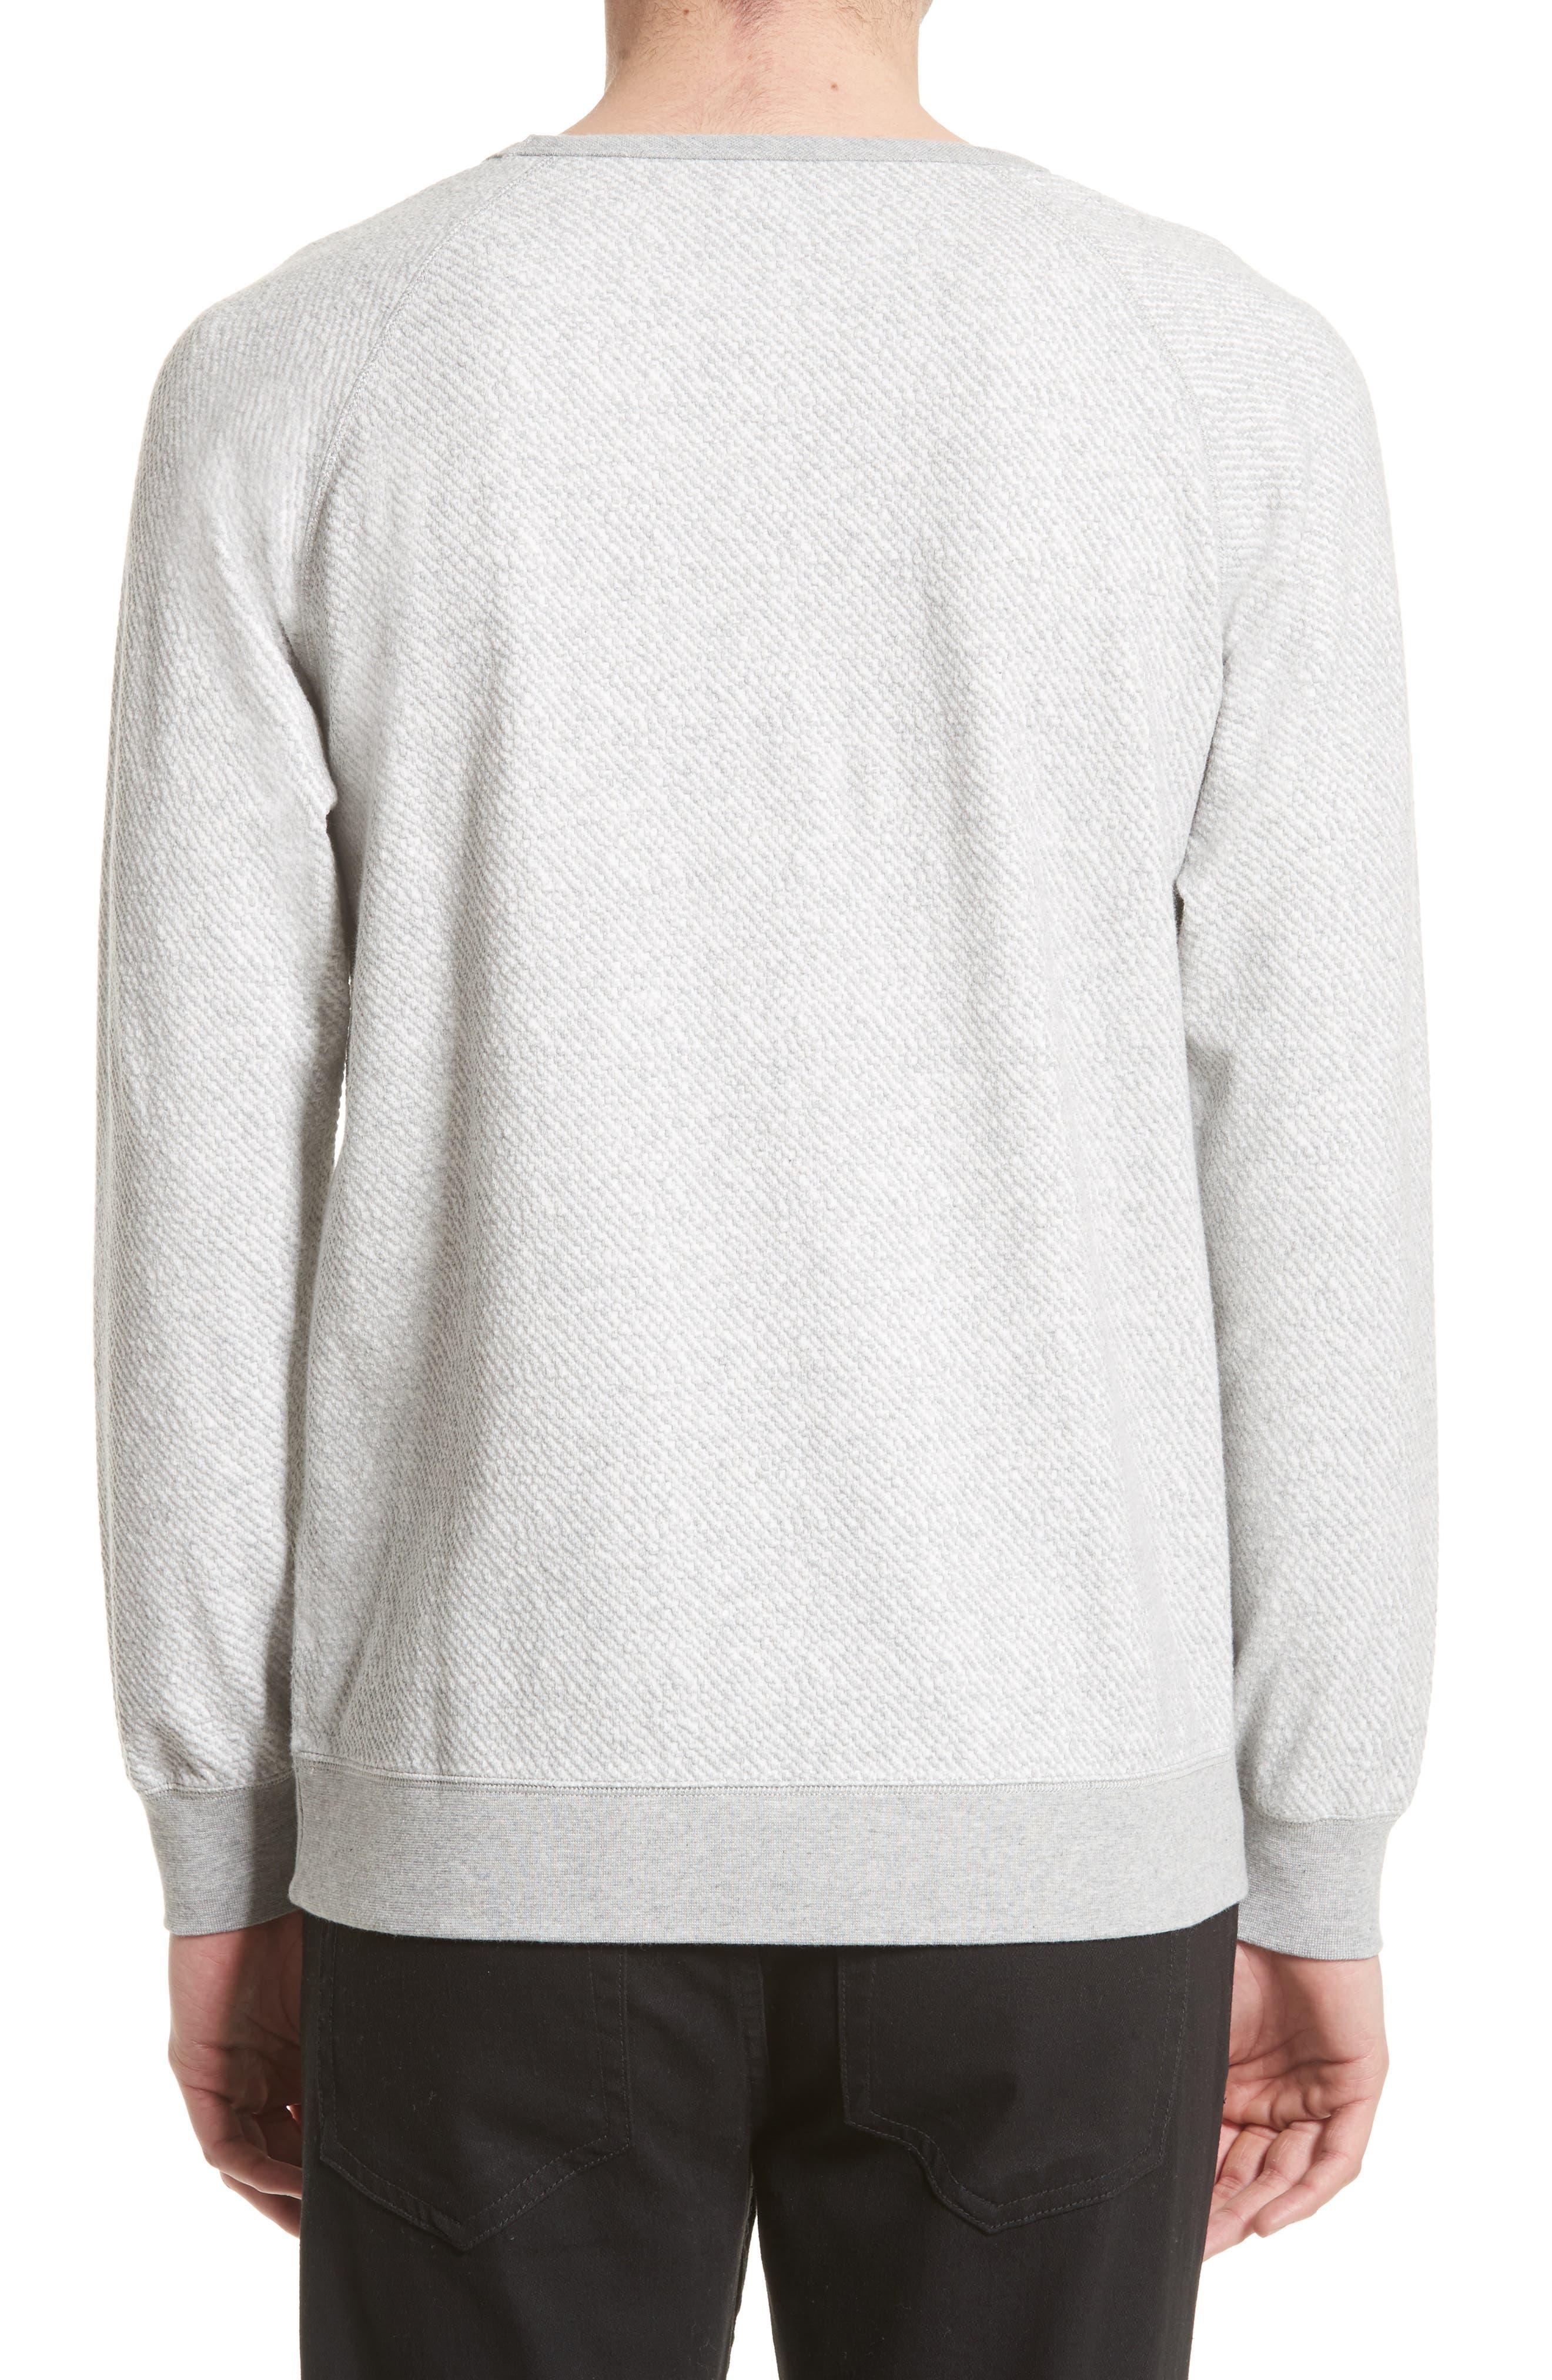 Kasu Sweater,                             Alternate thumbnail 3, color,